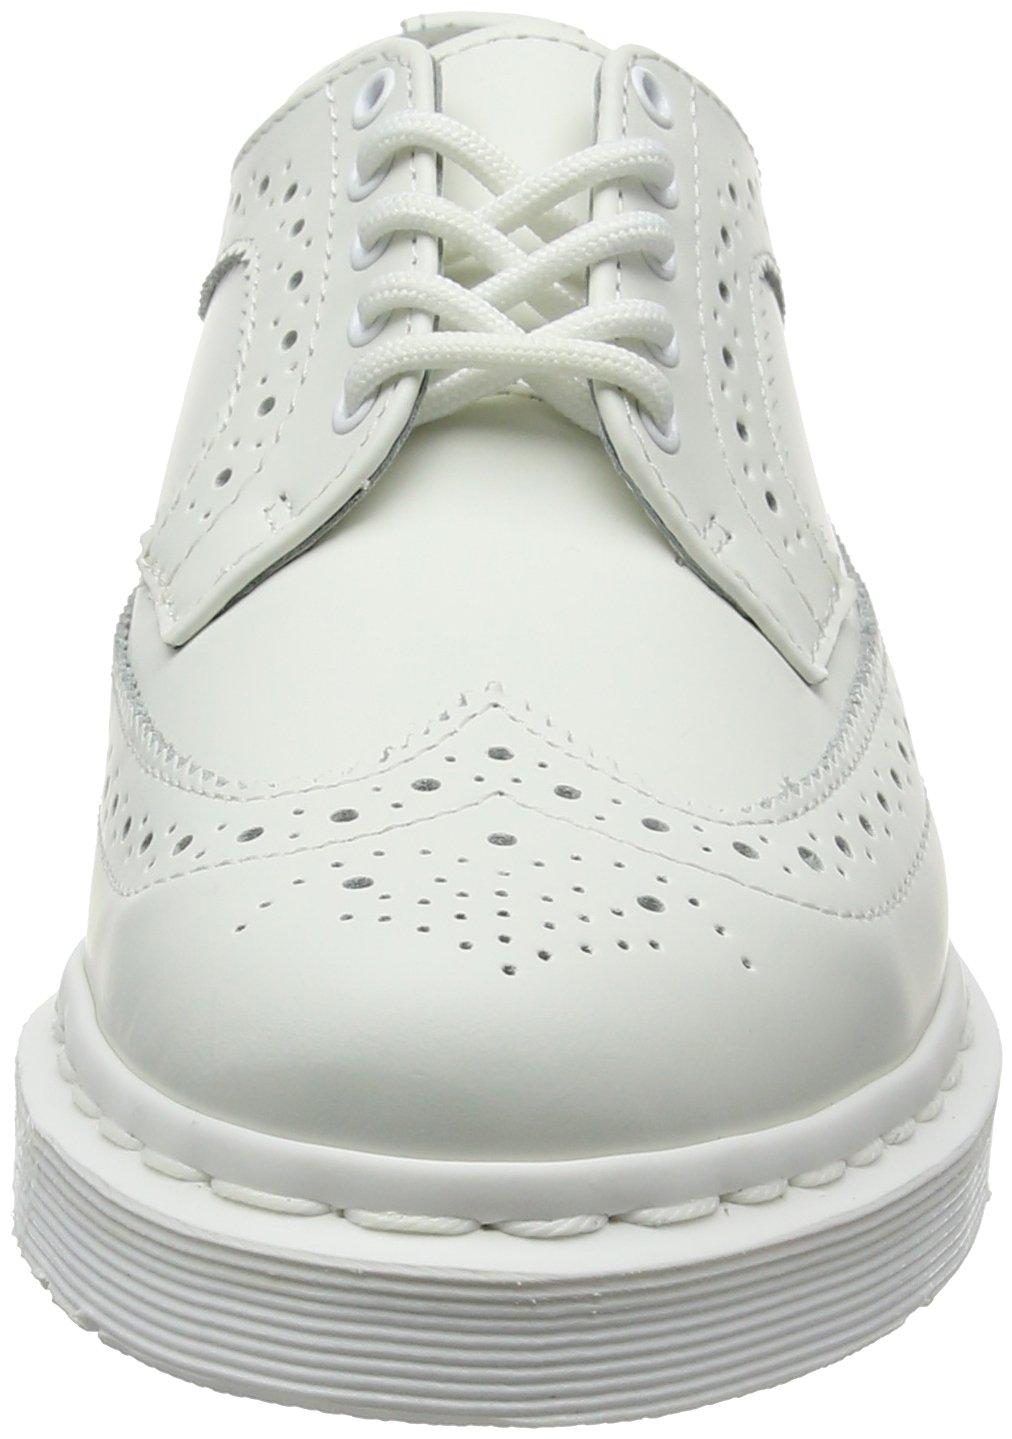 b71edfa428b Zapatos femeninos 3989 del Dr. Martens para mujer Blanco